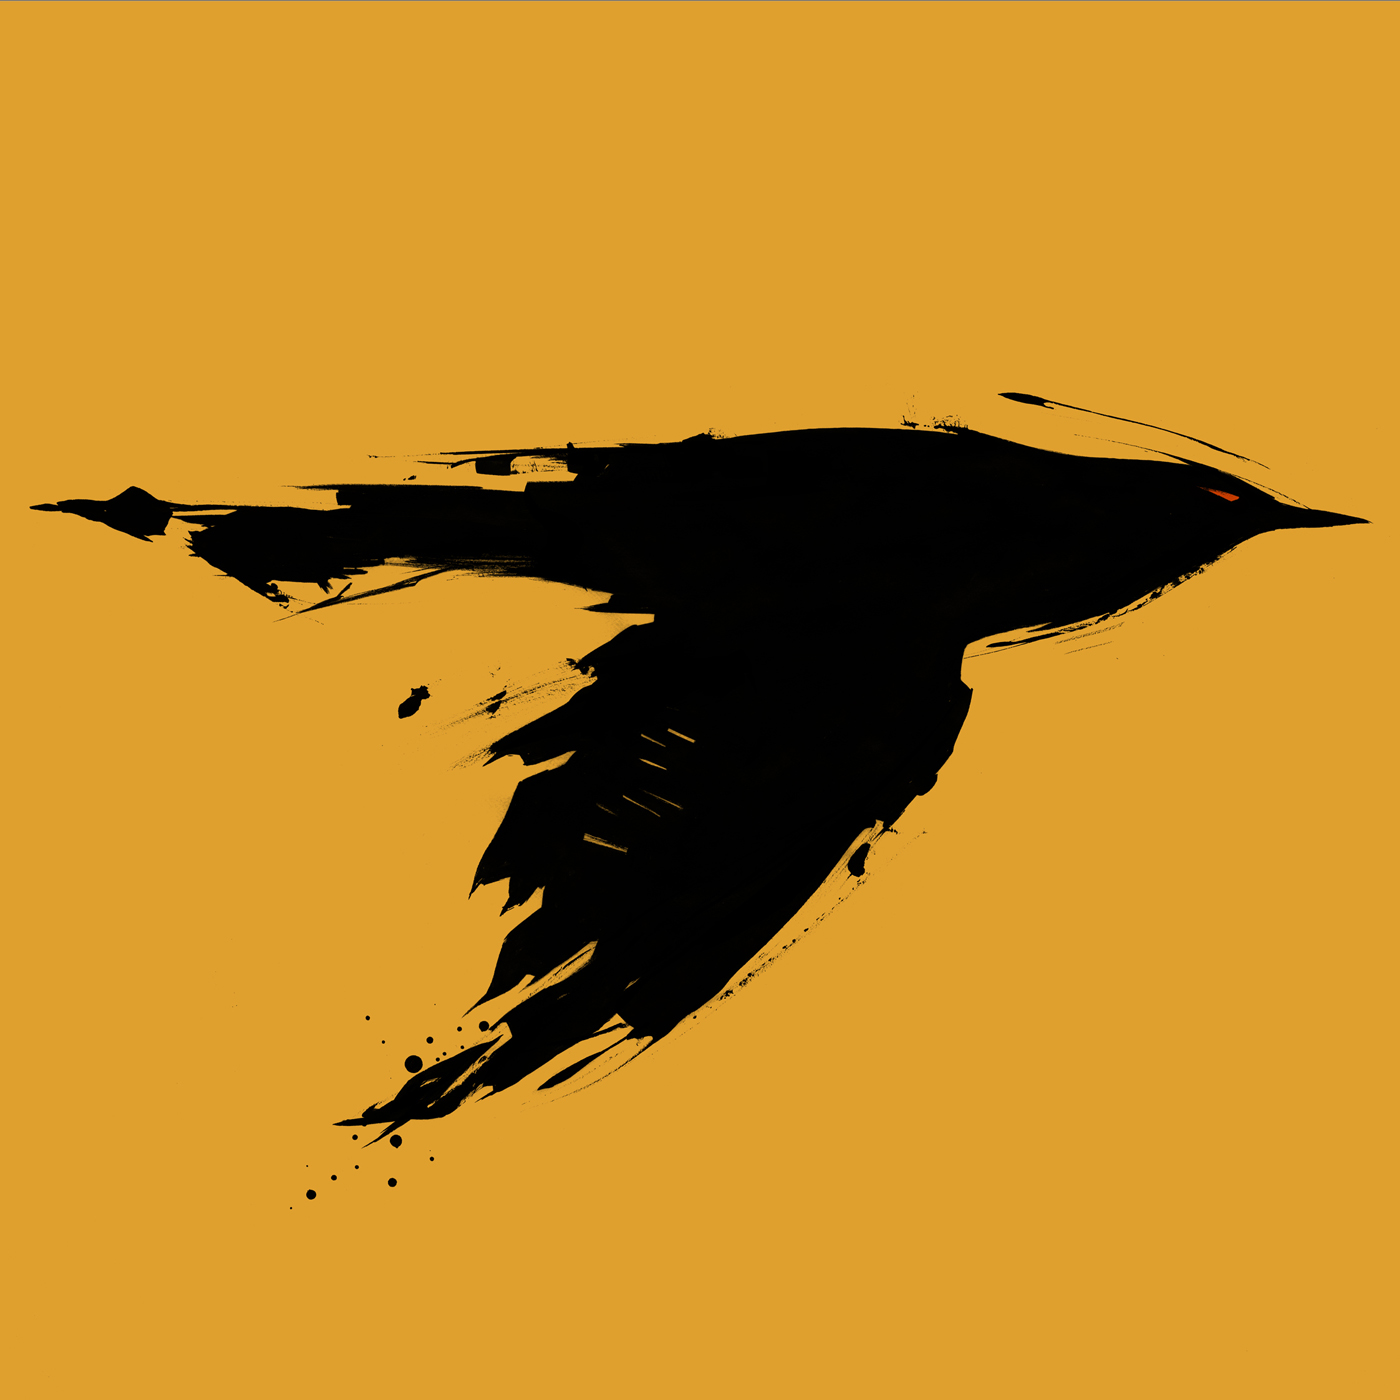 hdw.starling.be.jpg